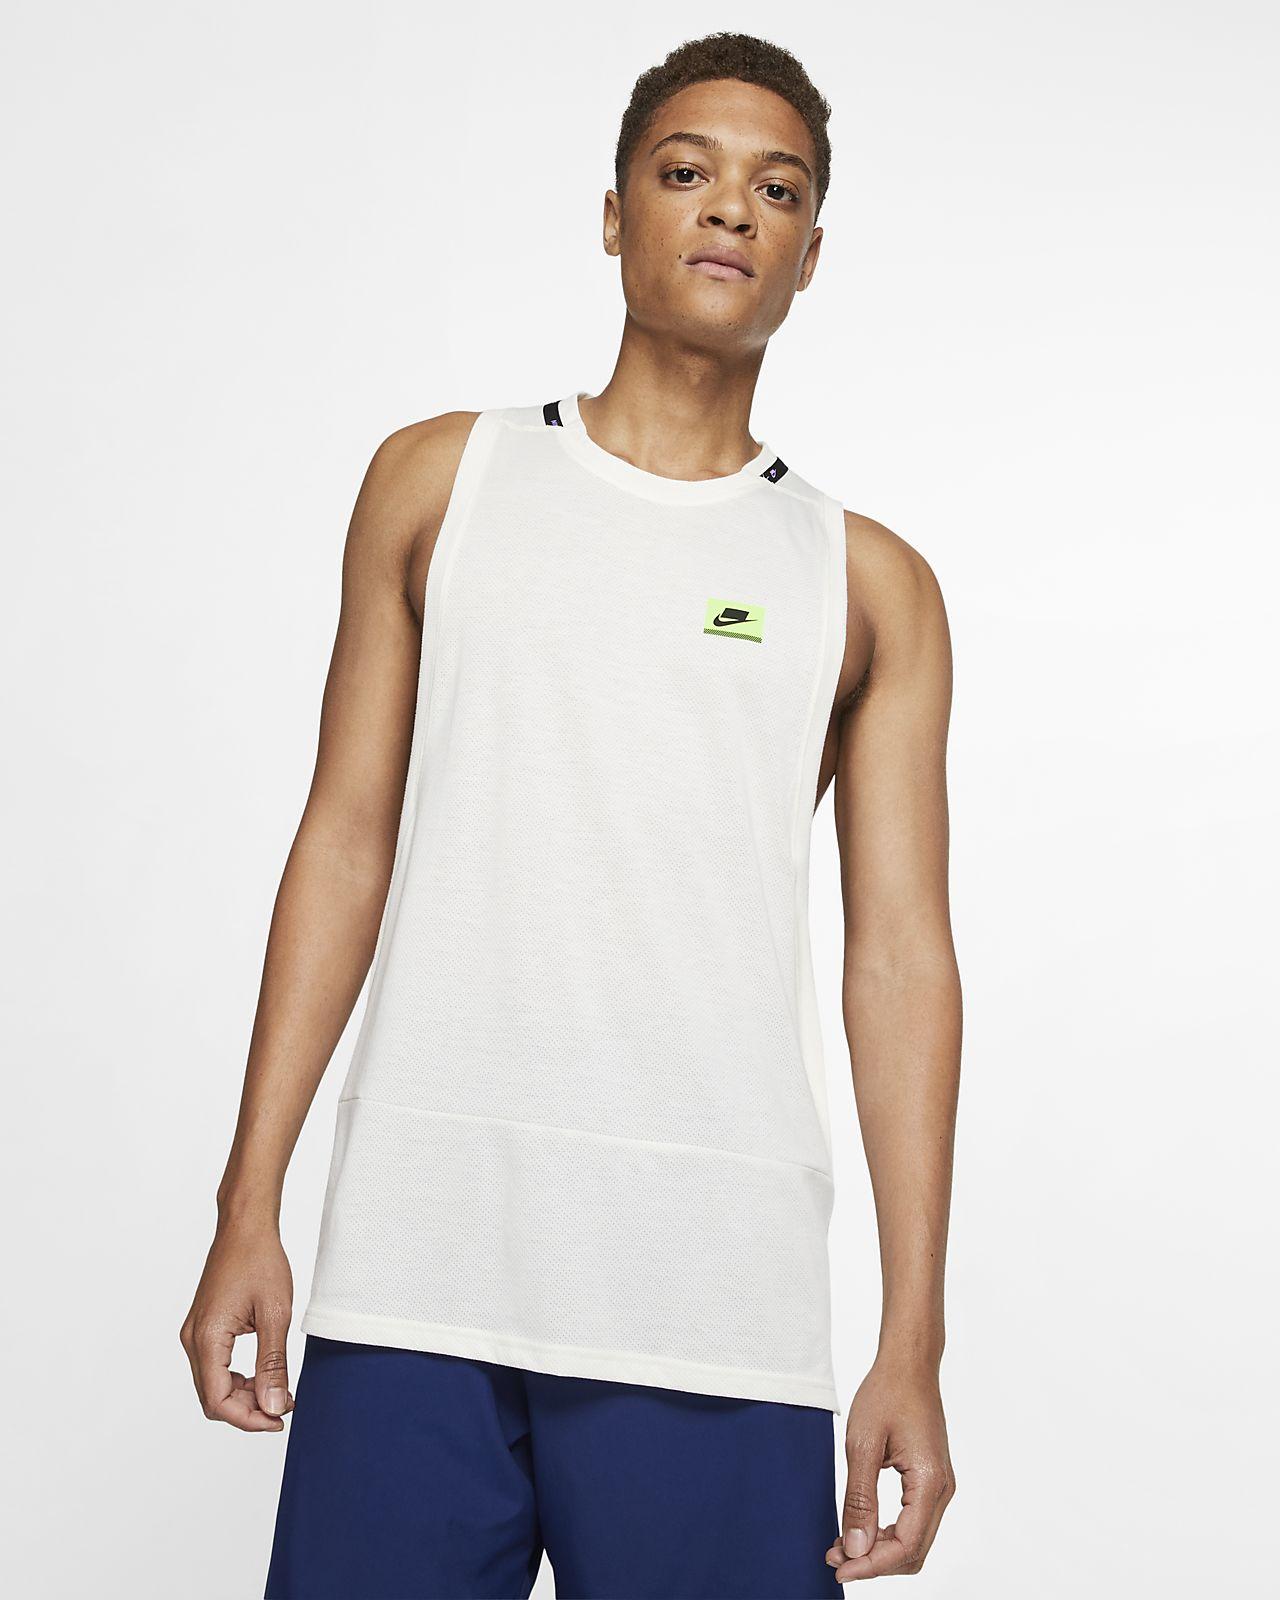 Camisola de treino sem mangas Nike Dri-FIT Sport Clash para homem